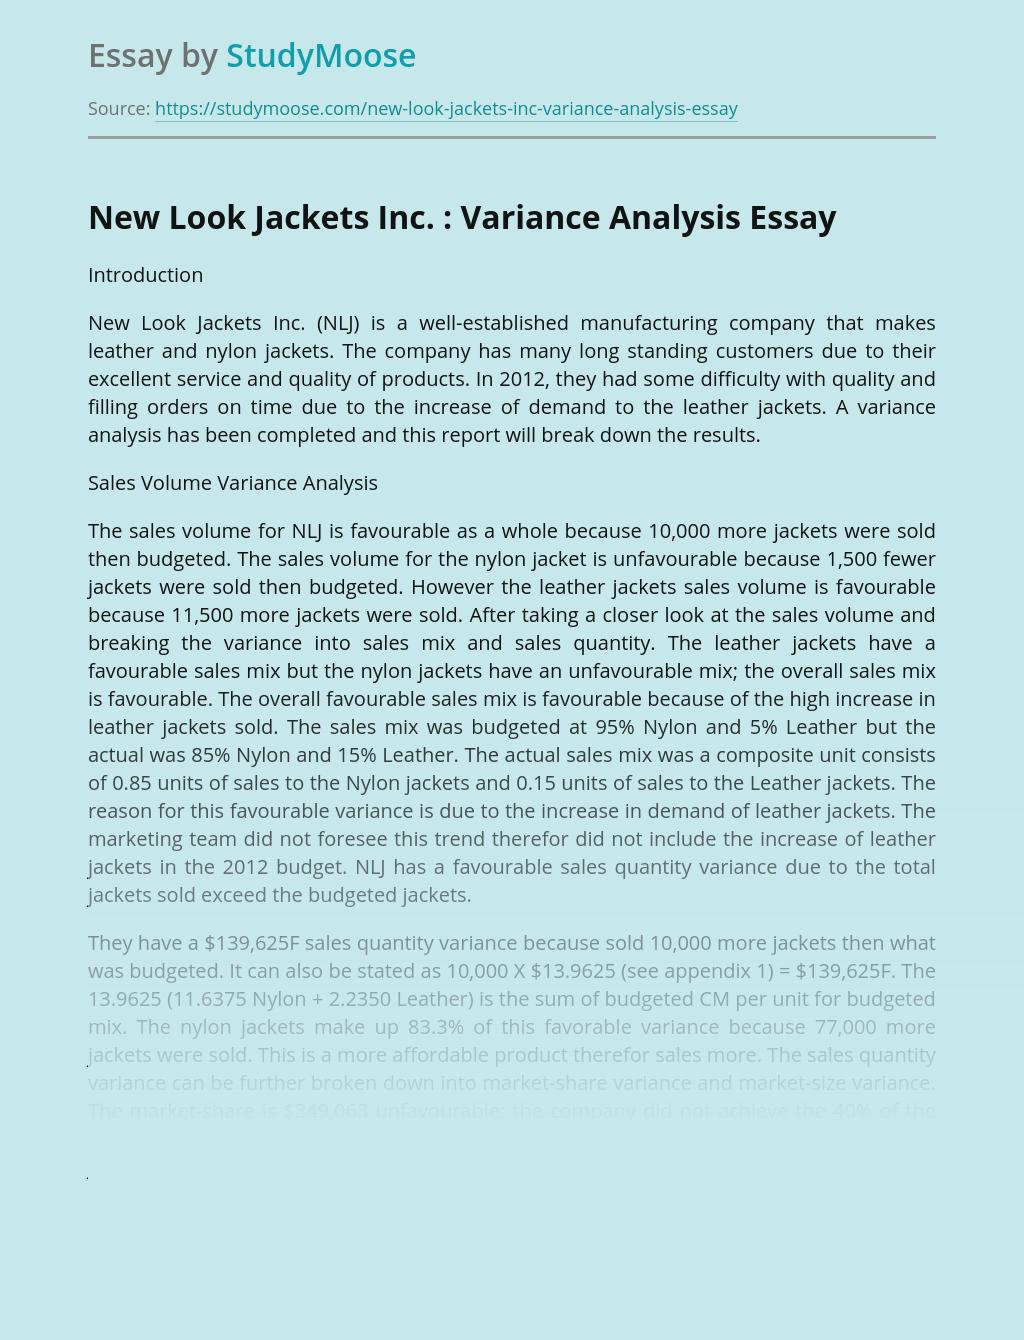 New Look Jackets Inc. : Variance Analysis